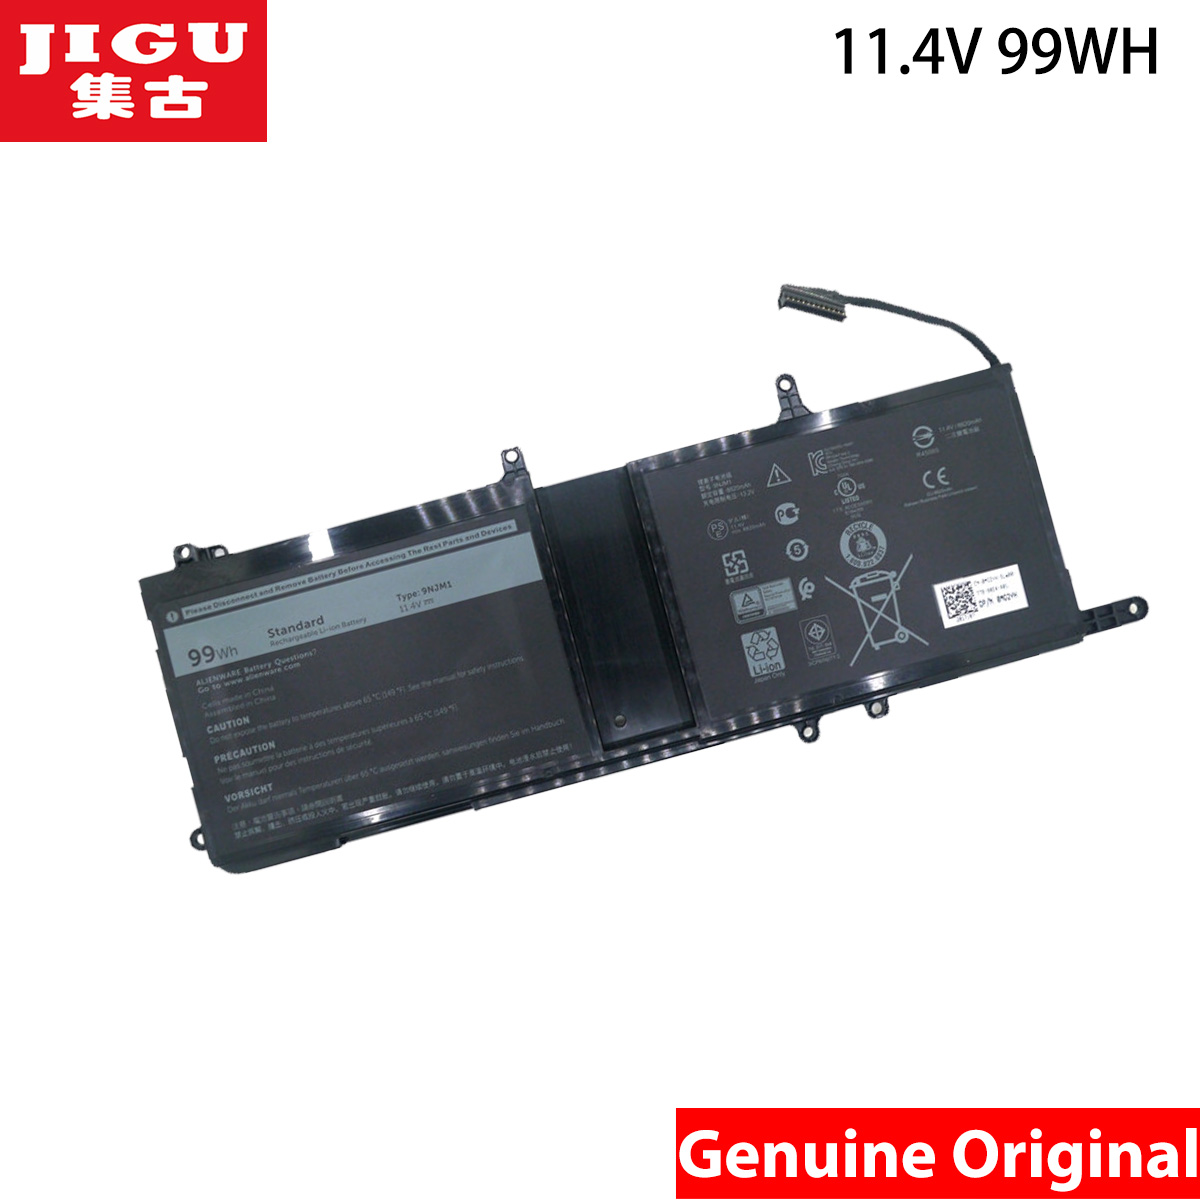 JIGU 11.4V 99WH Original 01D82 9NJM1 MG2YH Laptop Battery For Dell Alienware 17 R4 ALW17C-D1738 ALW17C-D1748 D1758 D1848 D2358 hot sale replacement laptop battery for dell alienware 15 r3 alienware 17 r4 0546ff 0hf250 44t2r 9njm1 hf250 mg2yh